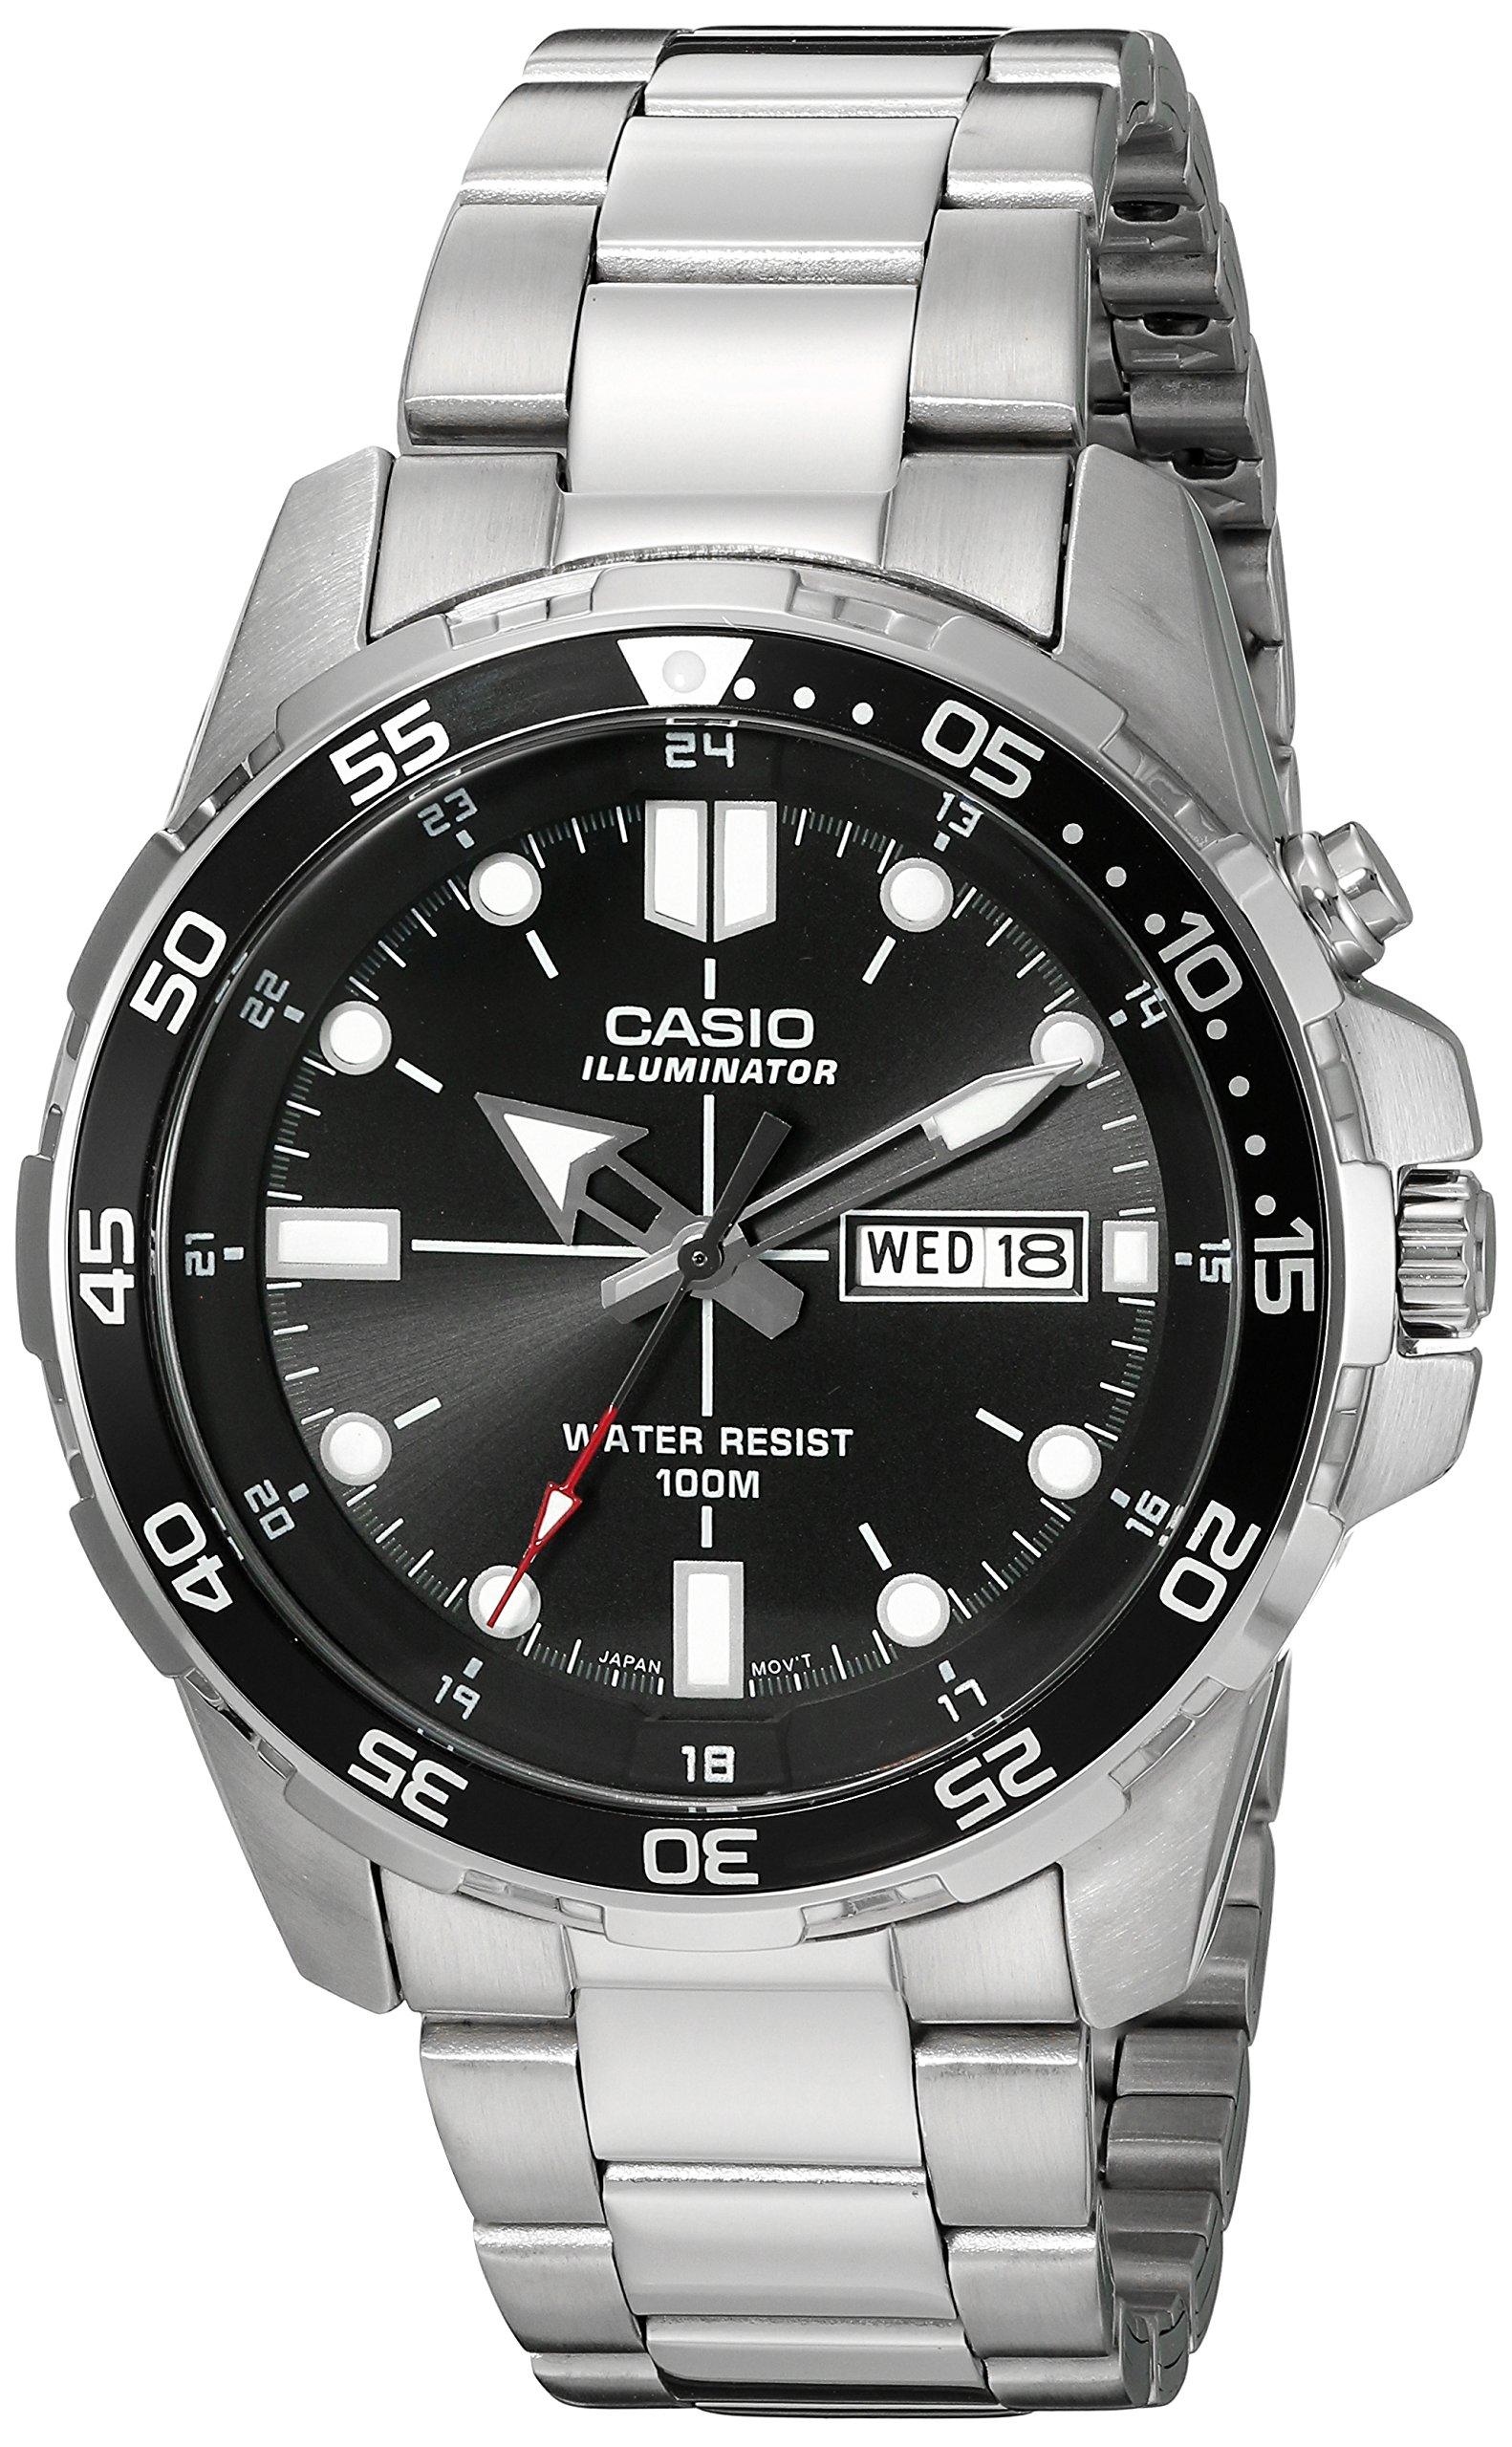 Casio Men's MTD-1079D-1AVCF Super Illuminator Diver Analog Display Quartz Silver Watch by Casio